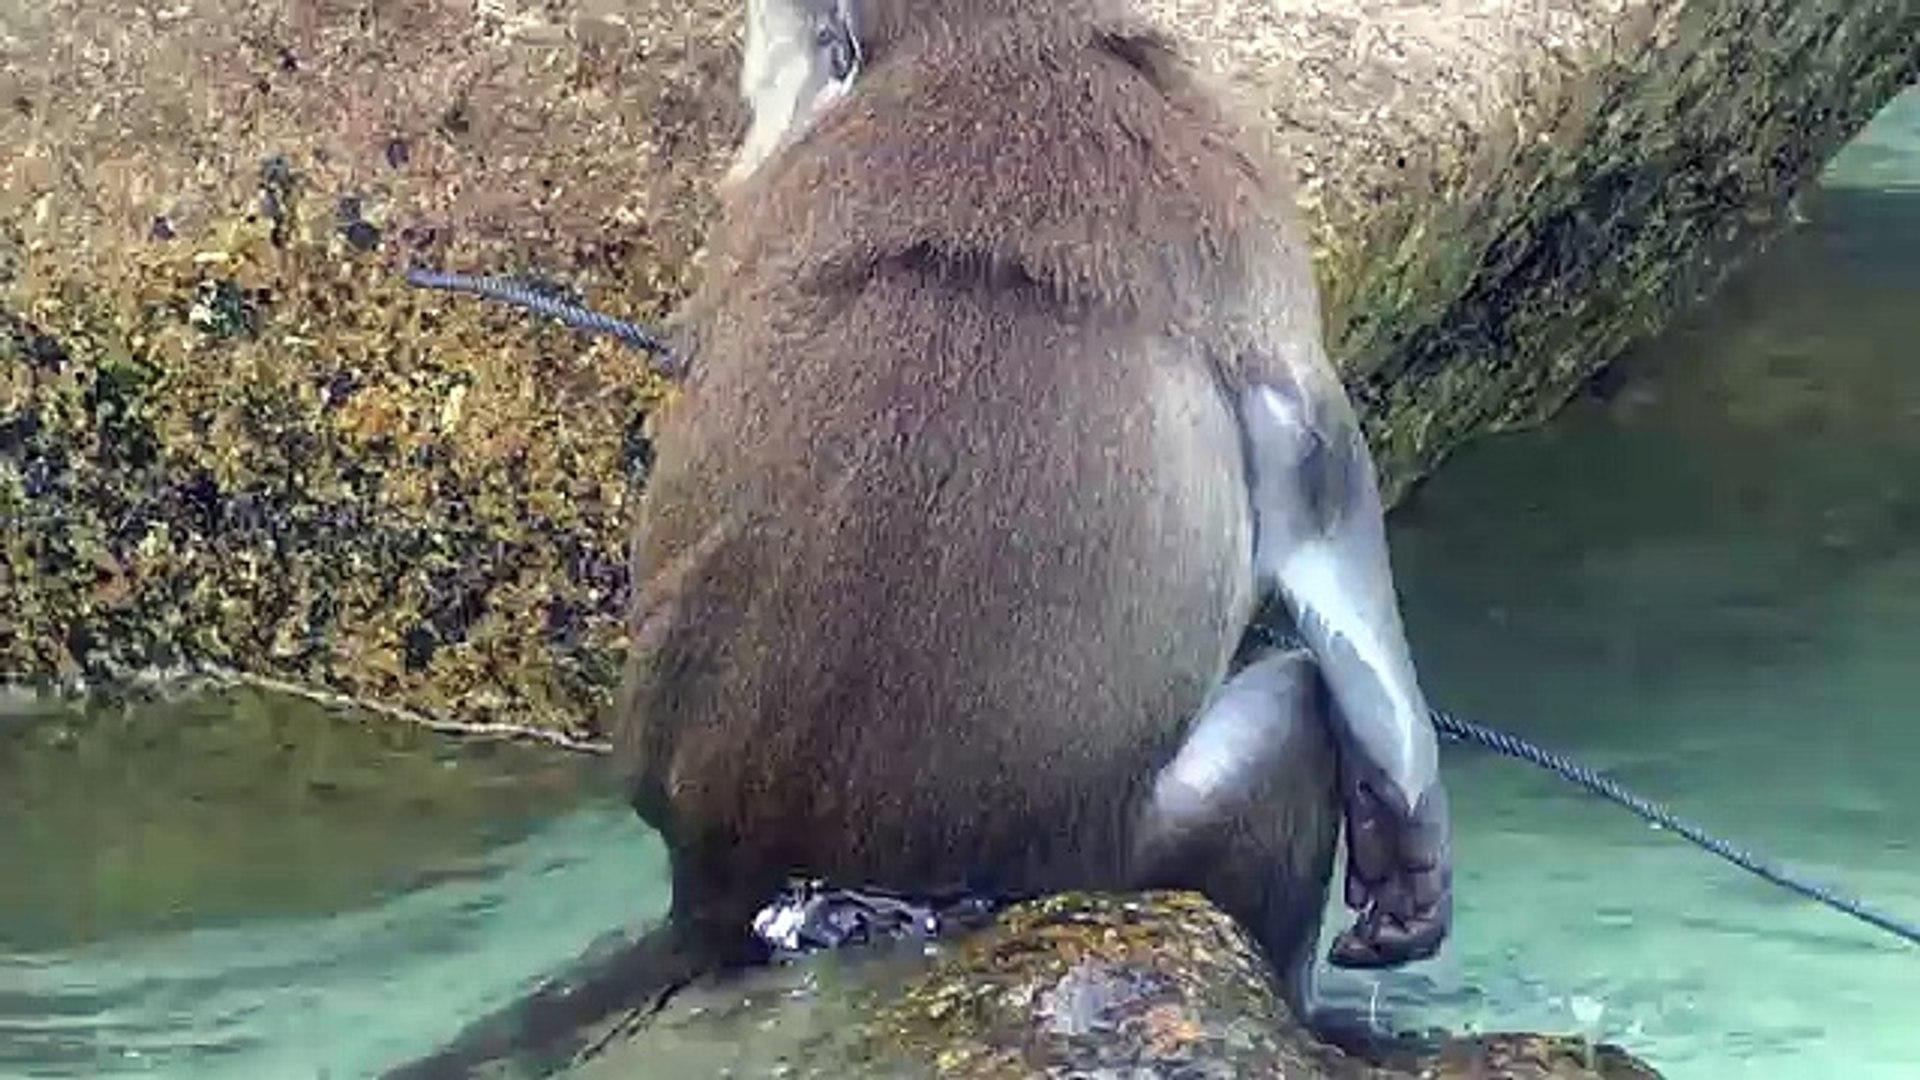 CUTE MONKEY VIDEO, FUNNY MONKEY VIDEO, MONKEY SWIMMING, CUTE ANIMALS, FUNNY VIDEOS